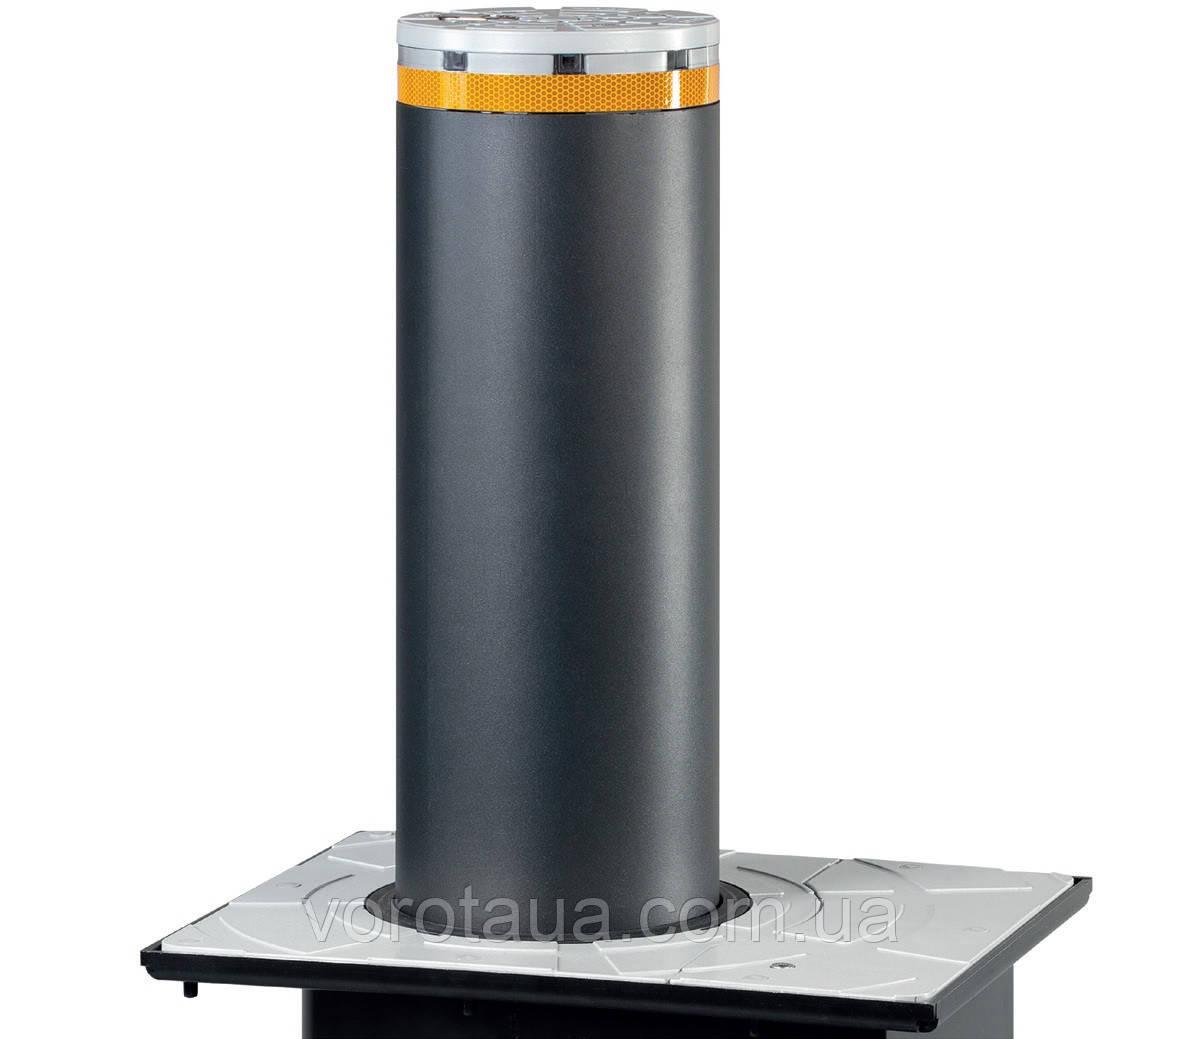 Болард стационарный   FAAC J200 F H600 высота 600 мм, диаметр 200 мм